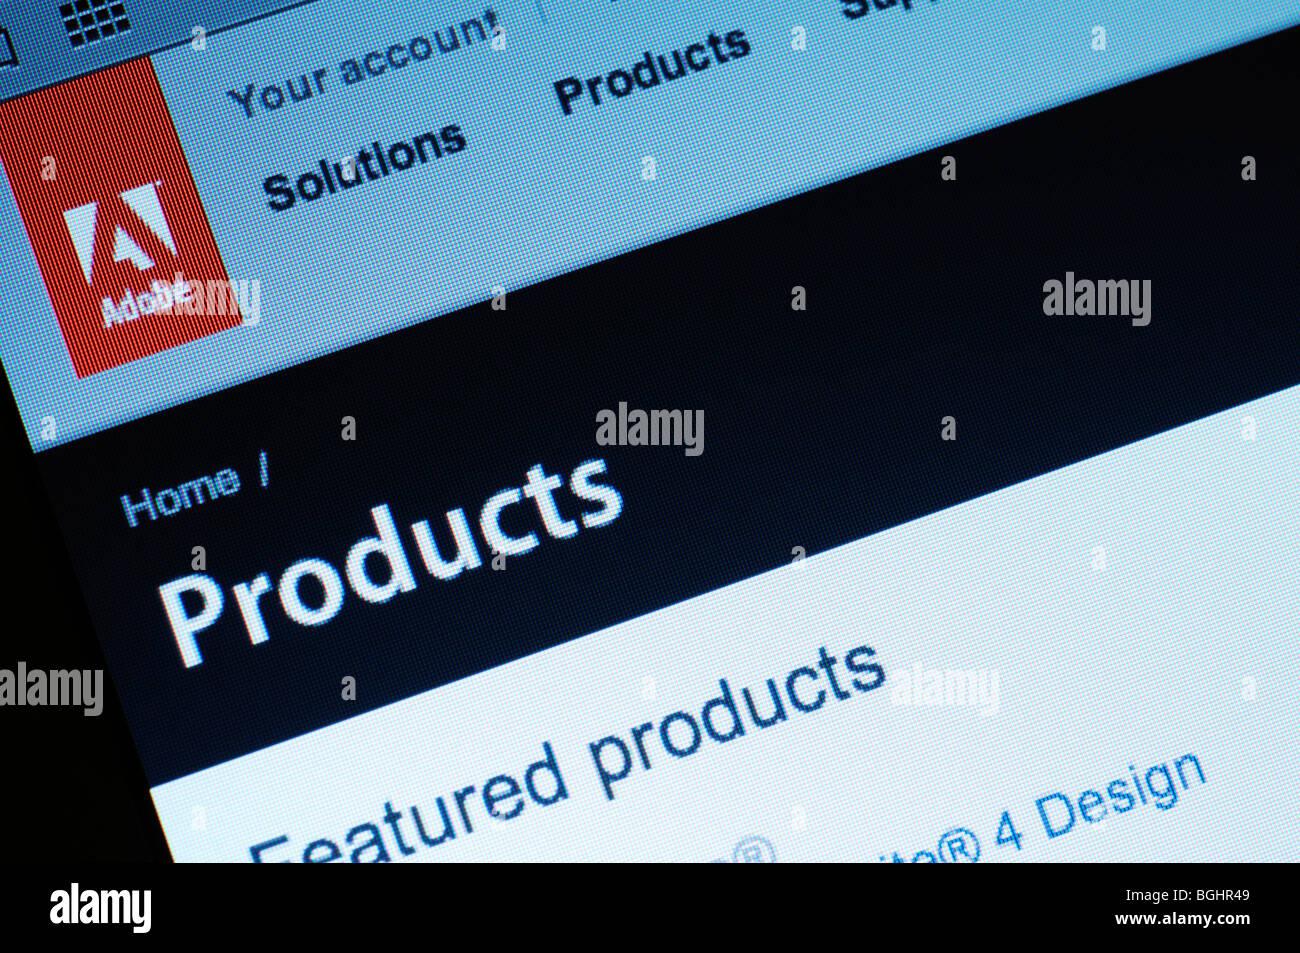 Adobe website - Stock Image